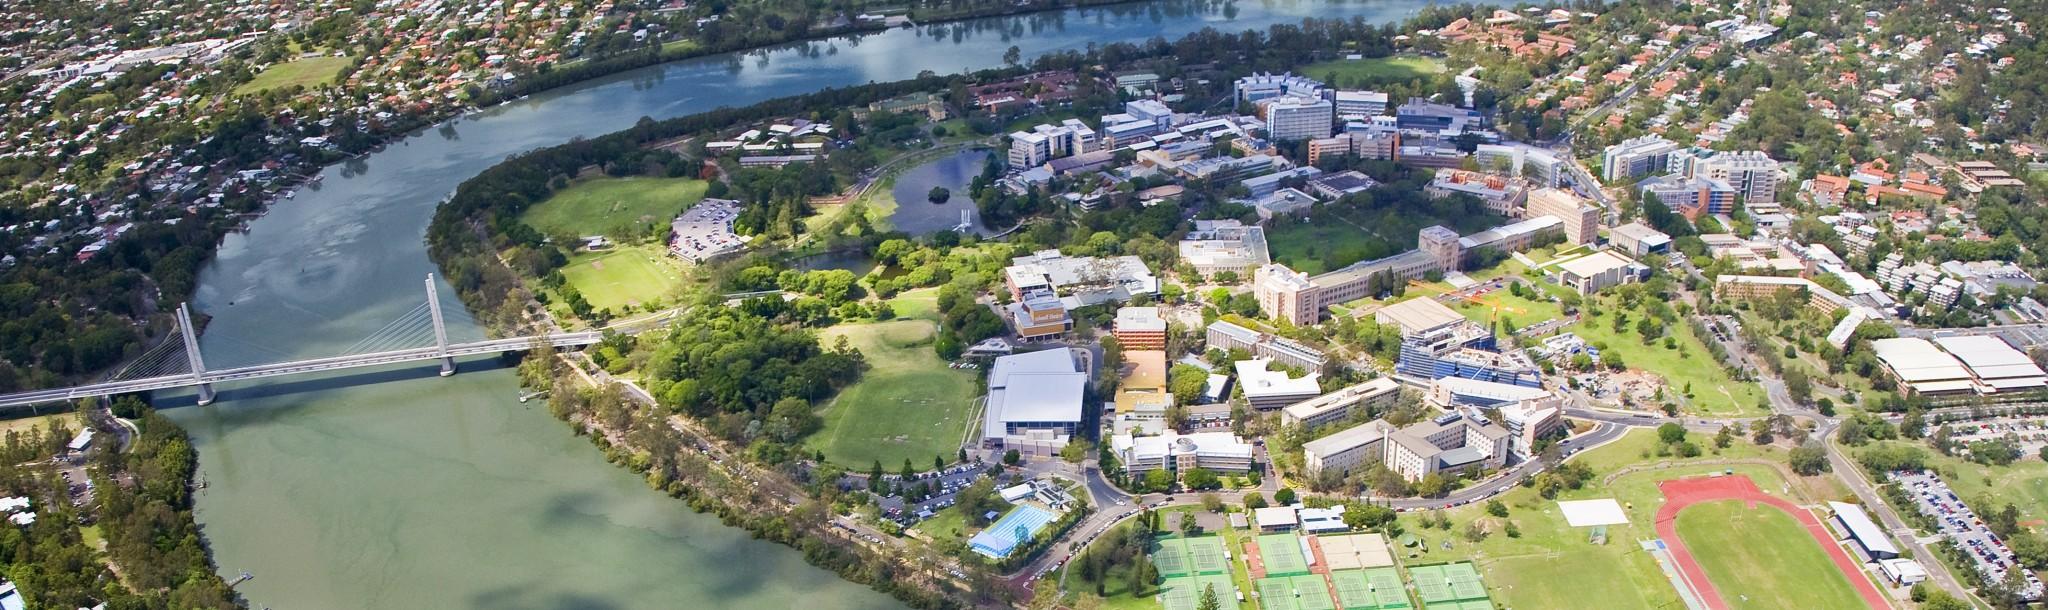 aerial-shot-of-the-uq-st-lucia-campus-1.jpg